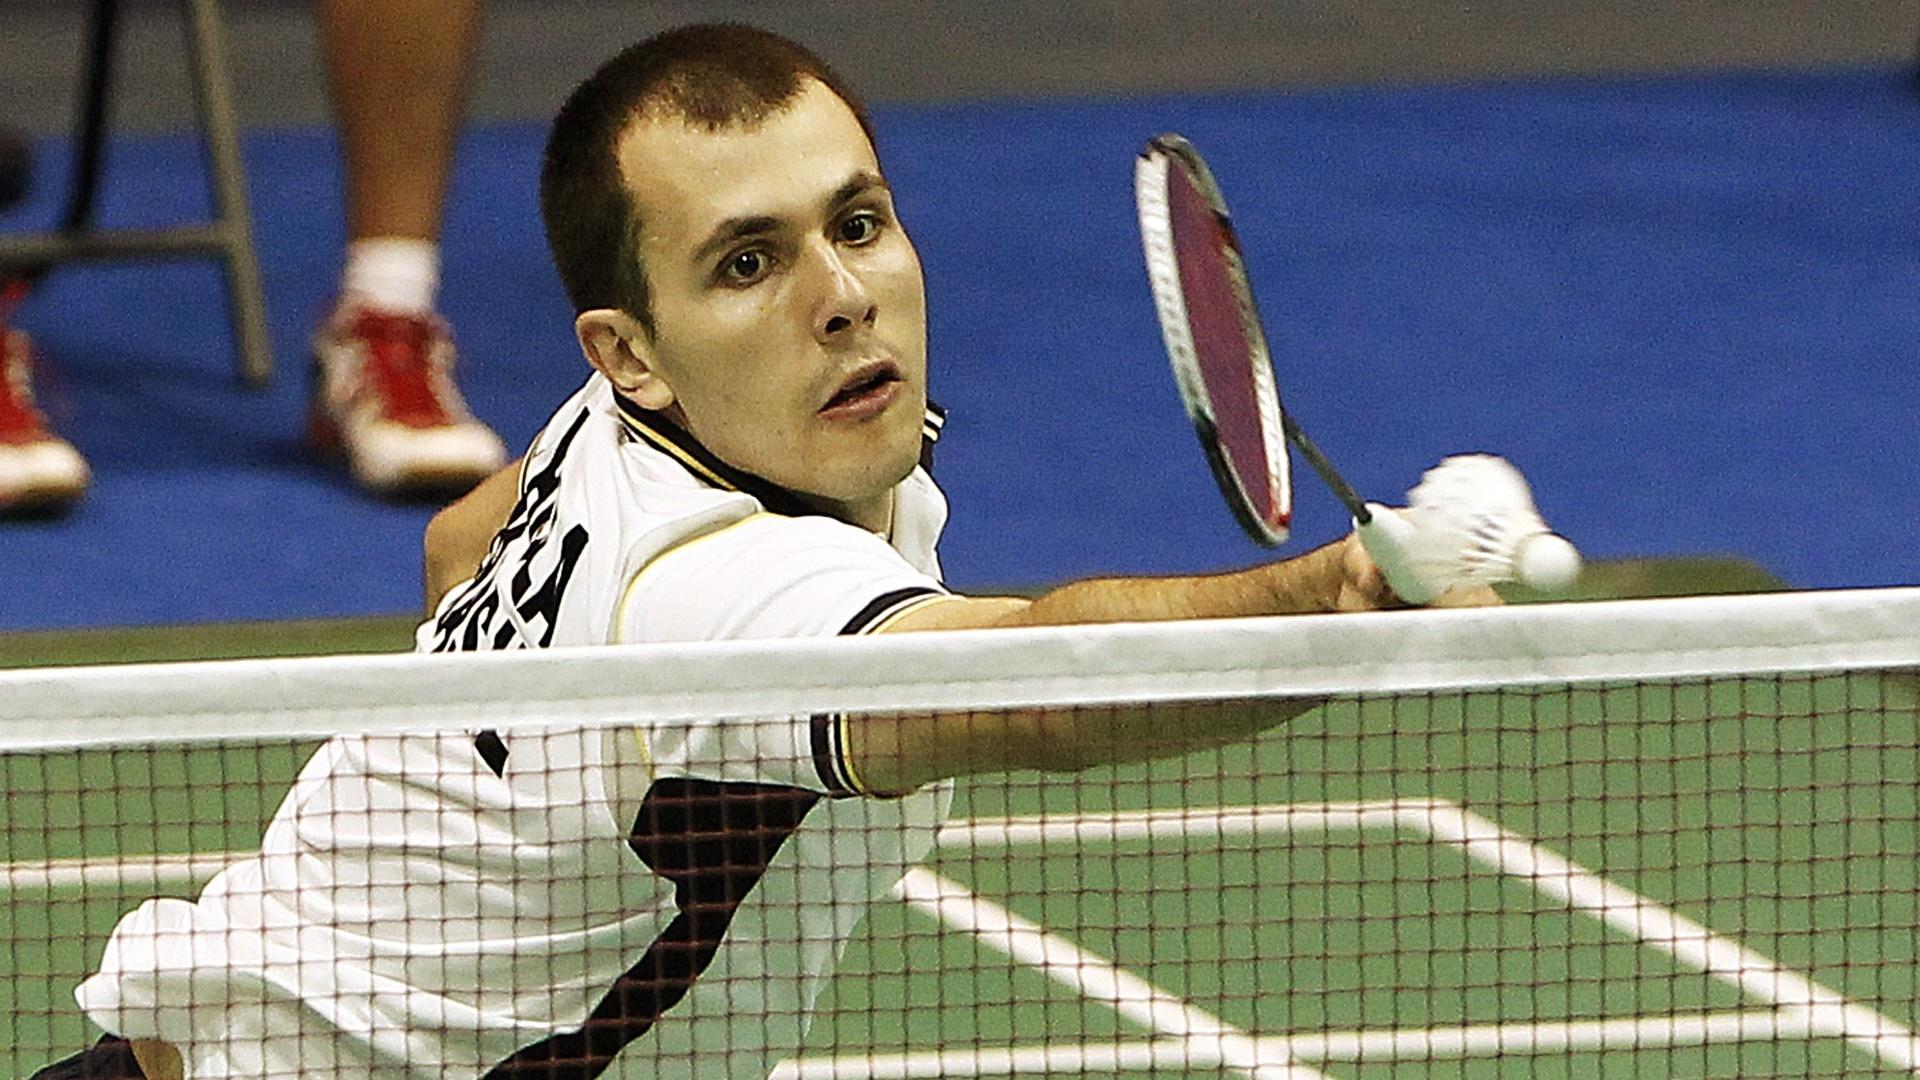 Daniel Paiola durante lance na derrota para guatemalteco na semifinal do badminton; o brasileiro ficou com o bronze (18/10/2011)